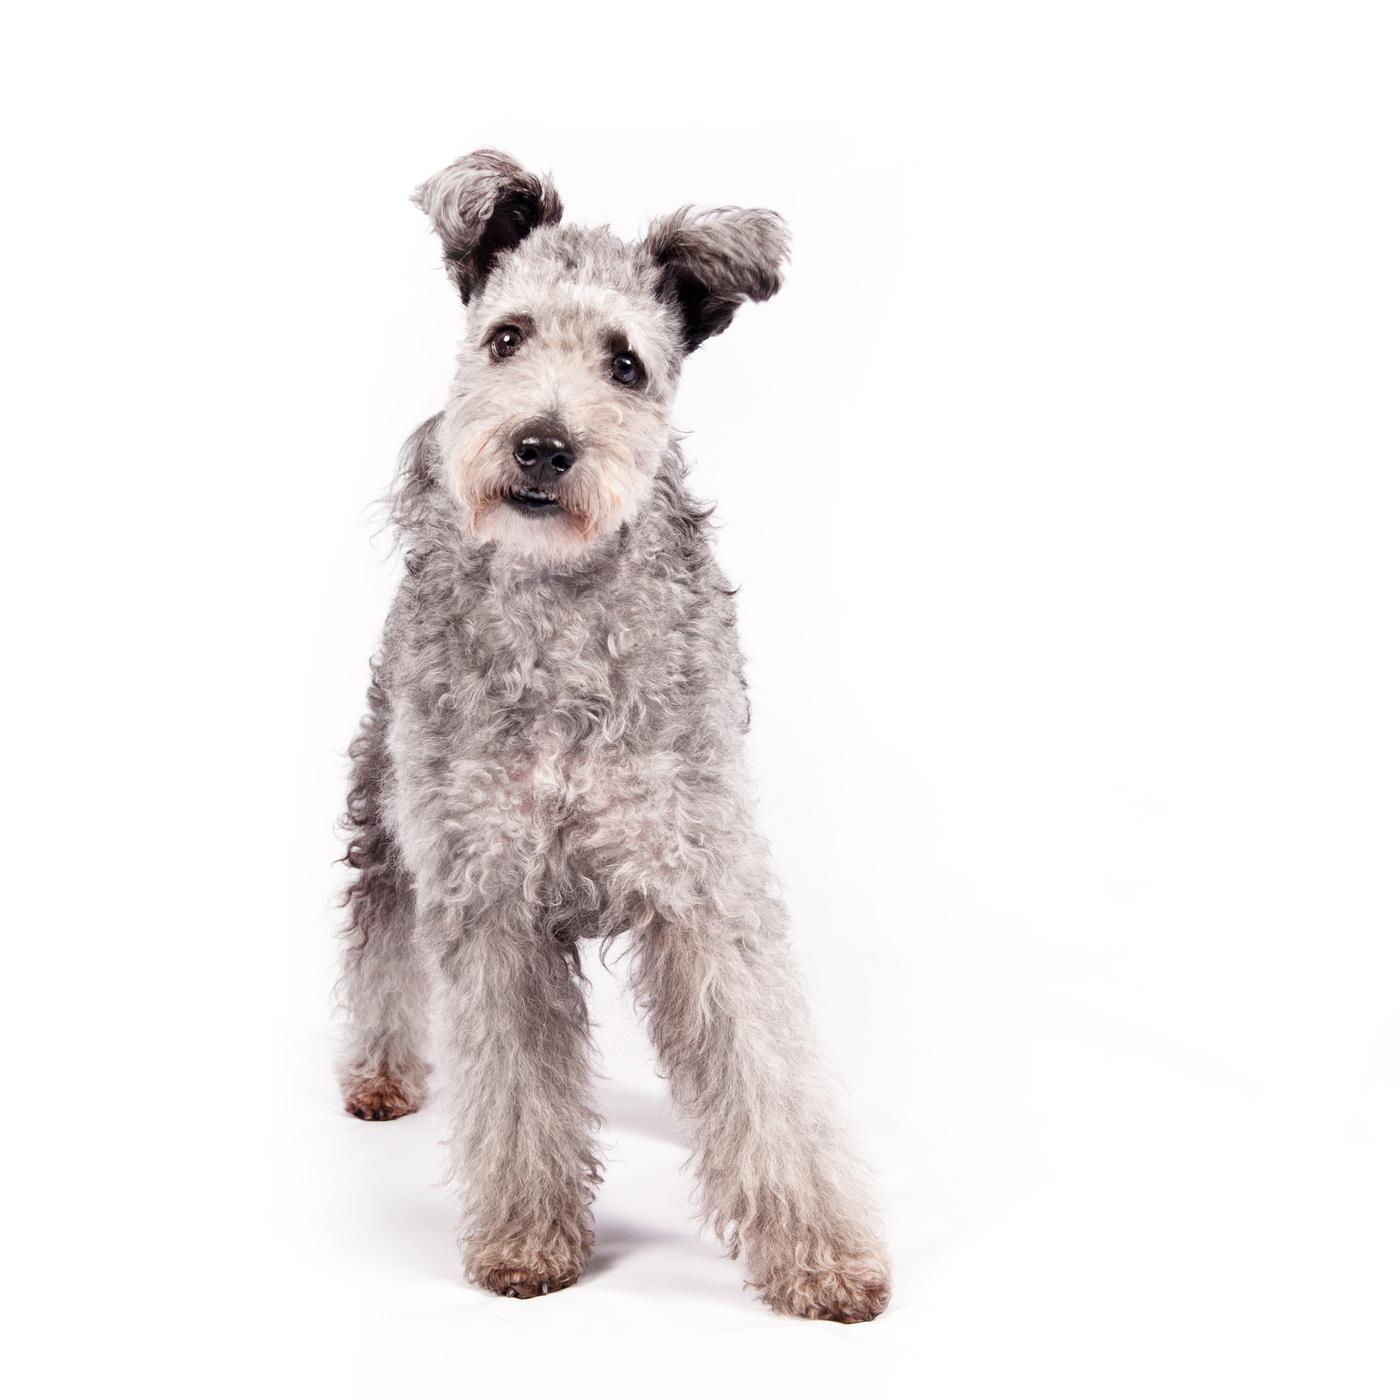 Dog Show Pumi